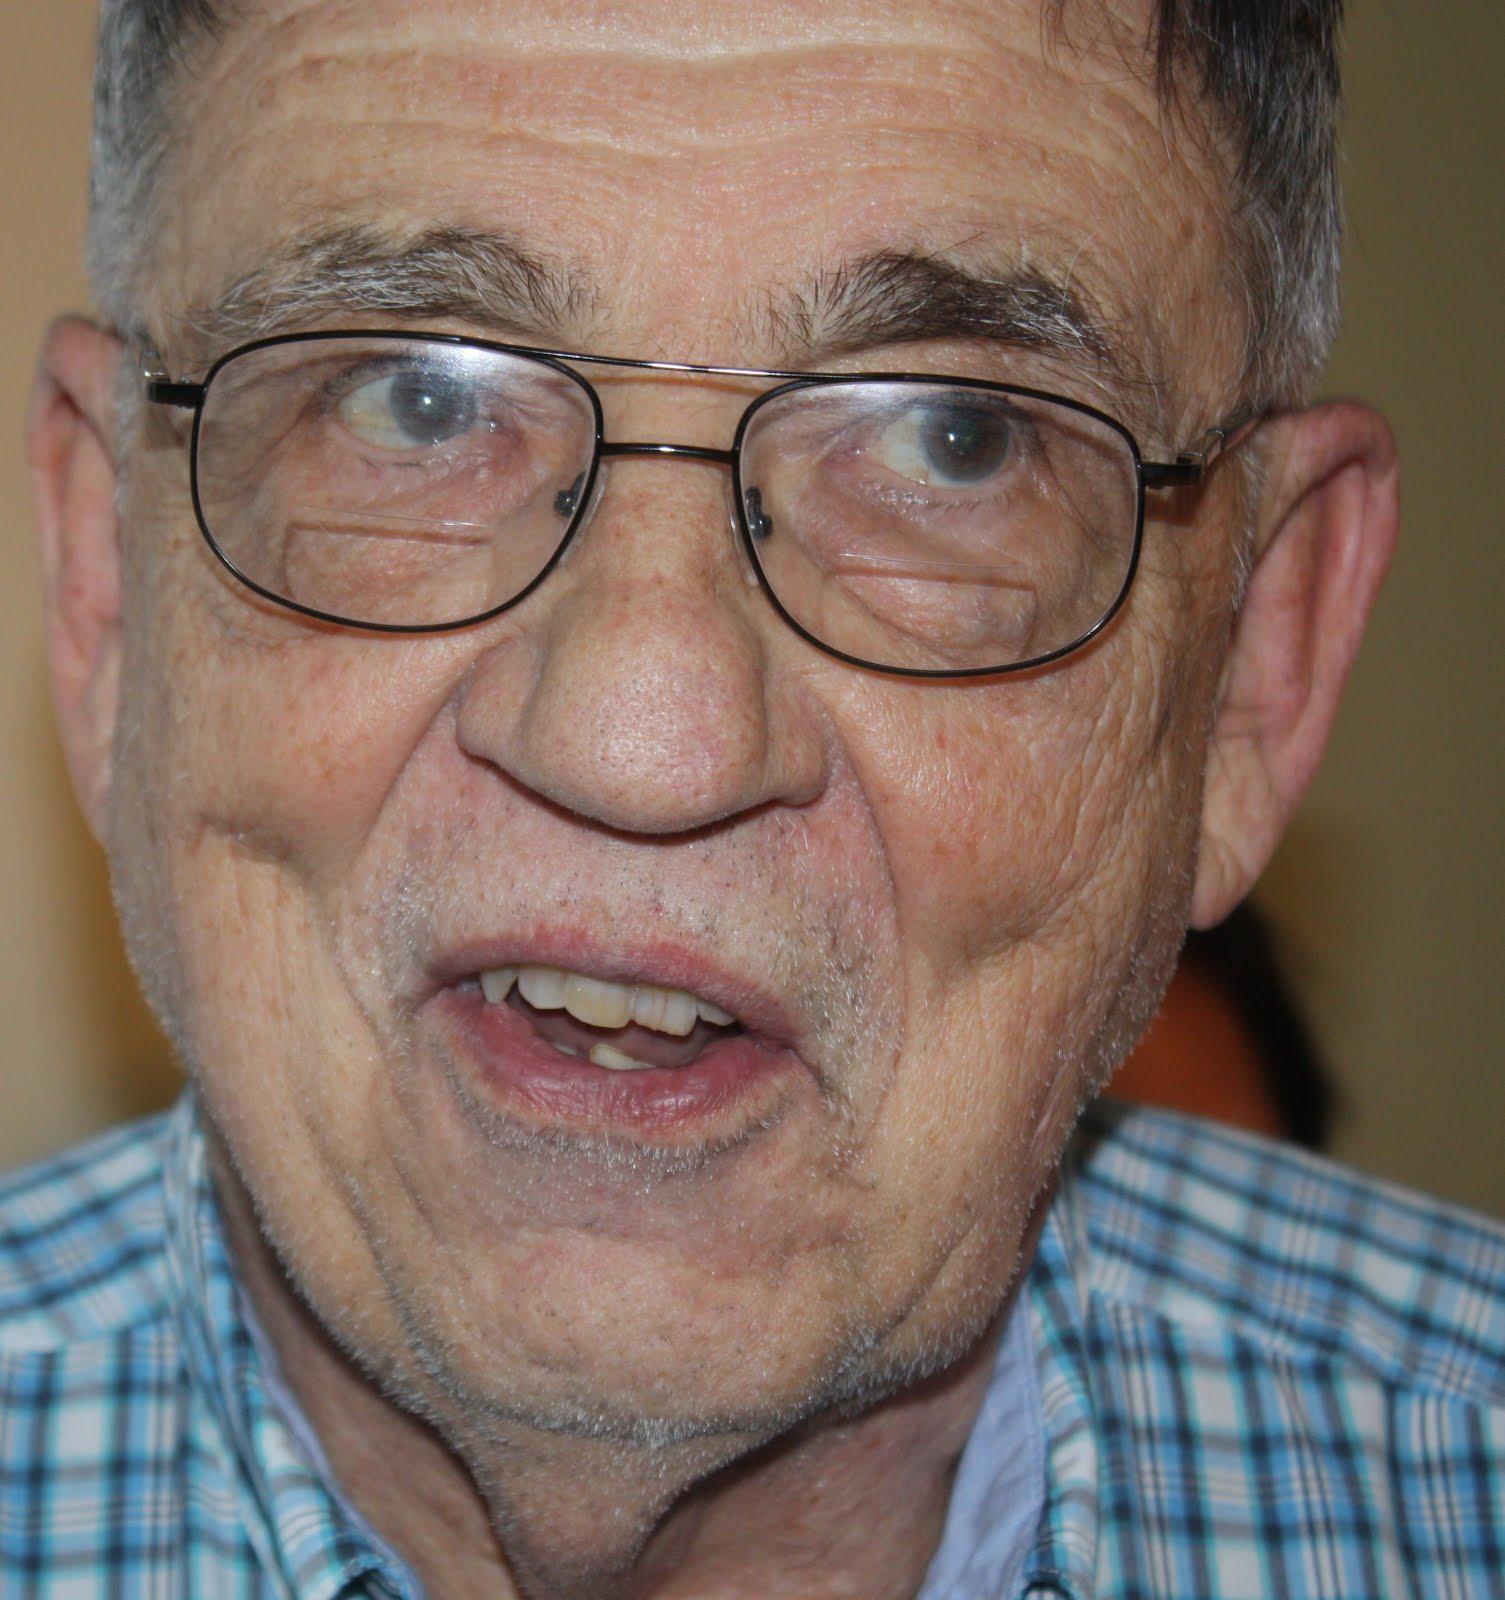 John Alvarez Obituary - San Antonio, TX - dignitymemorial.com